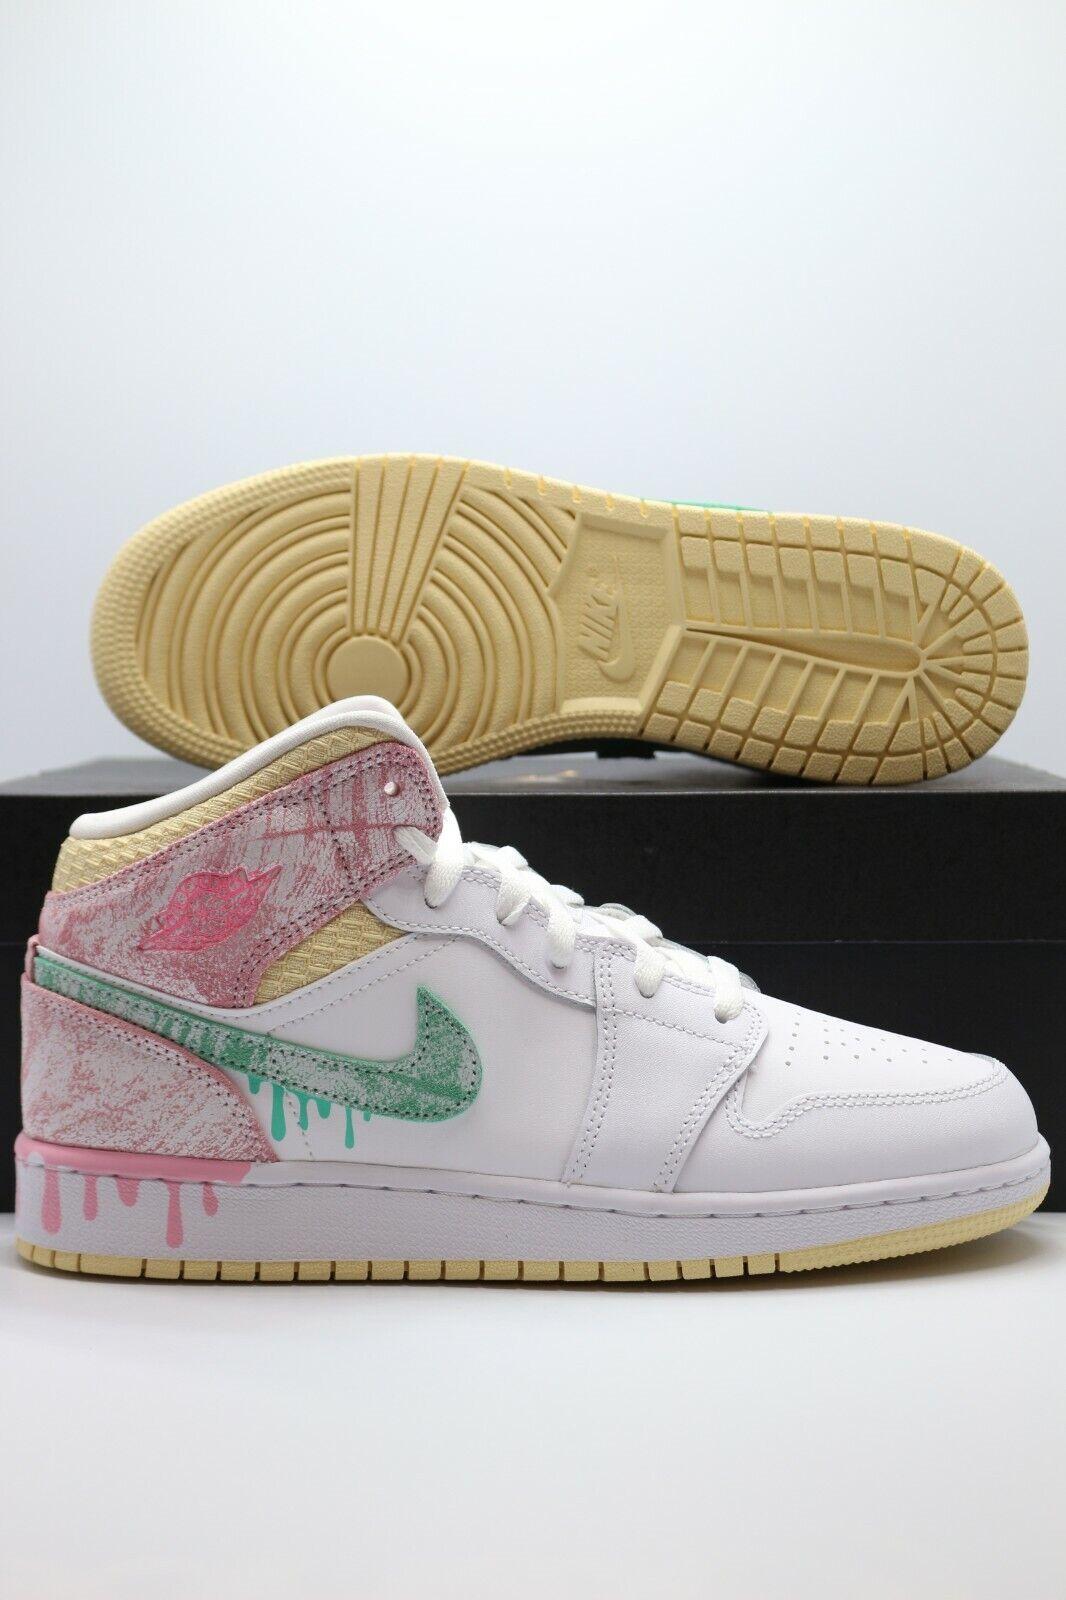 Nike Air Jordan 1 Mid GS Paint Drip Ice Cream White Pink DD1666-100 Size 3.5-7Y